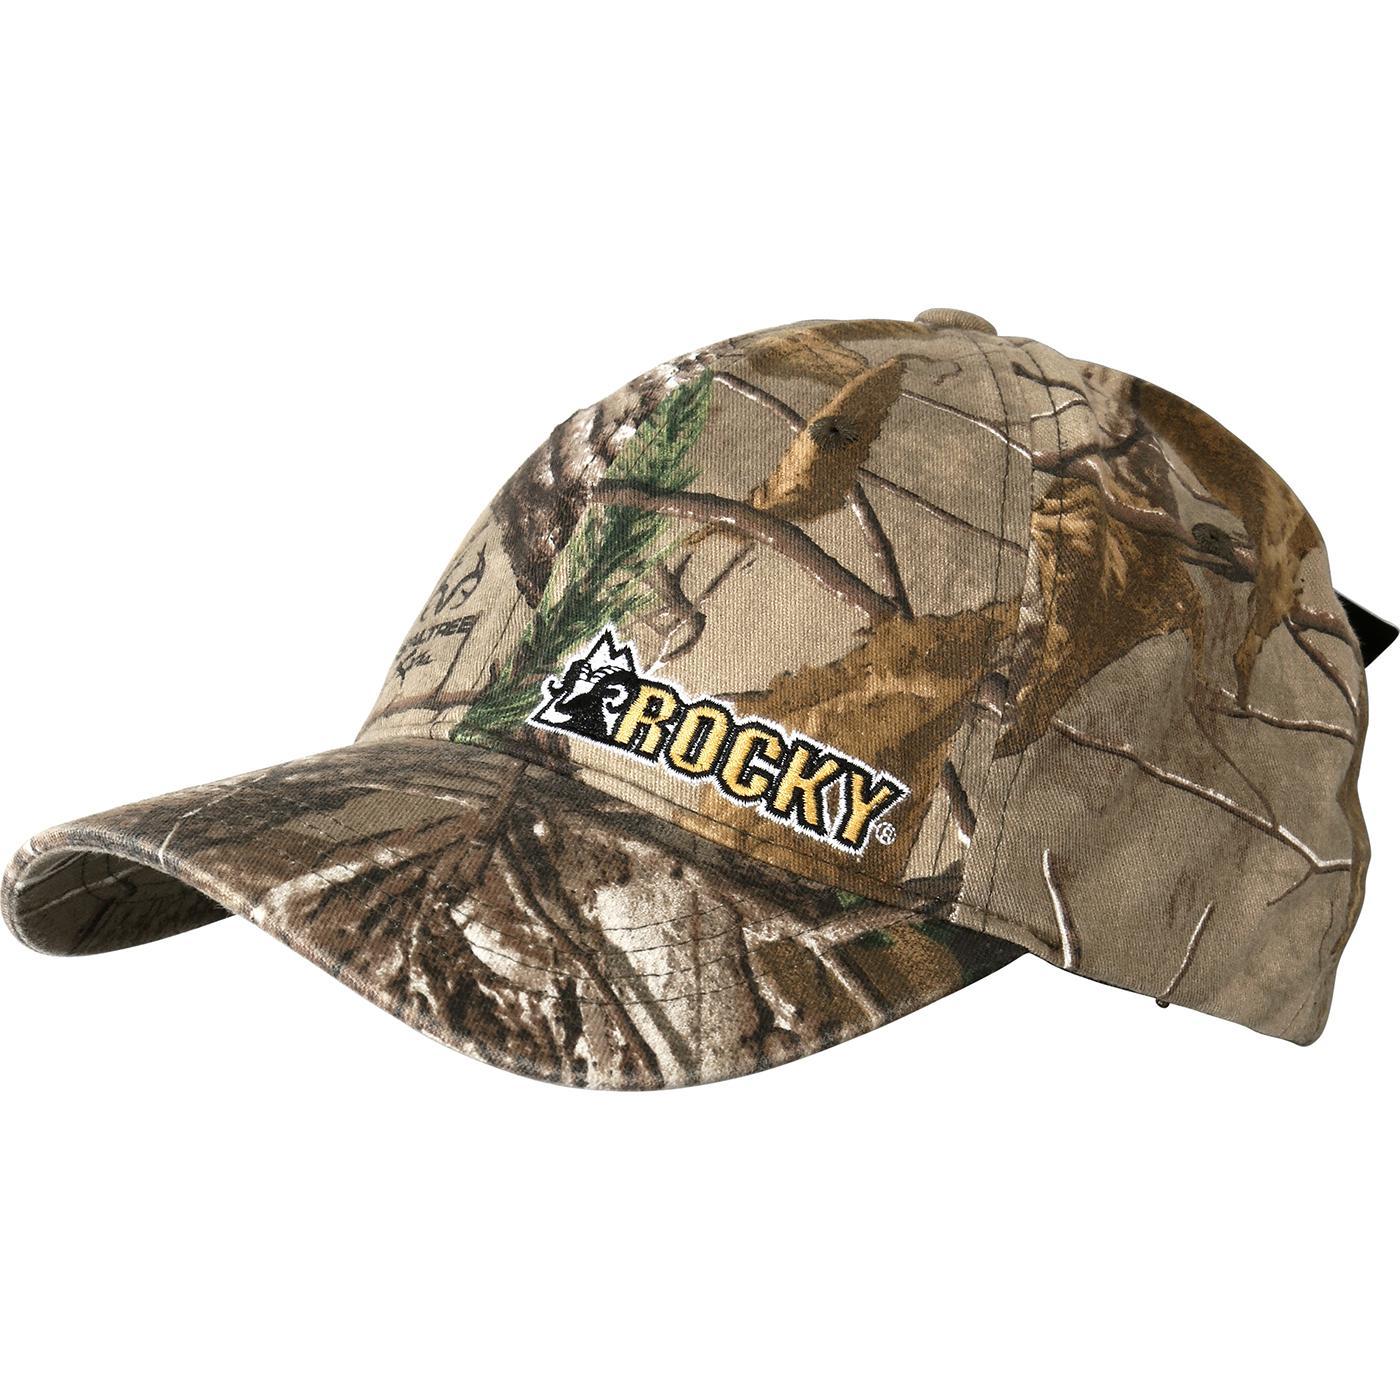 Rocky Boots Camouflage Men S Flex Fit Ball Cap Lw00050